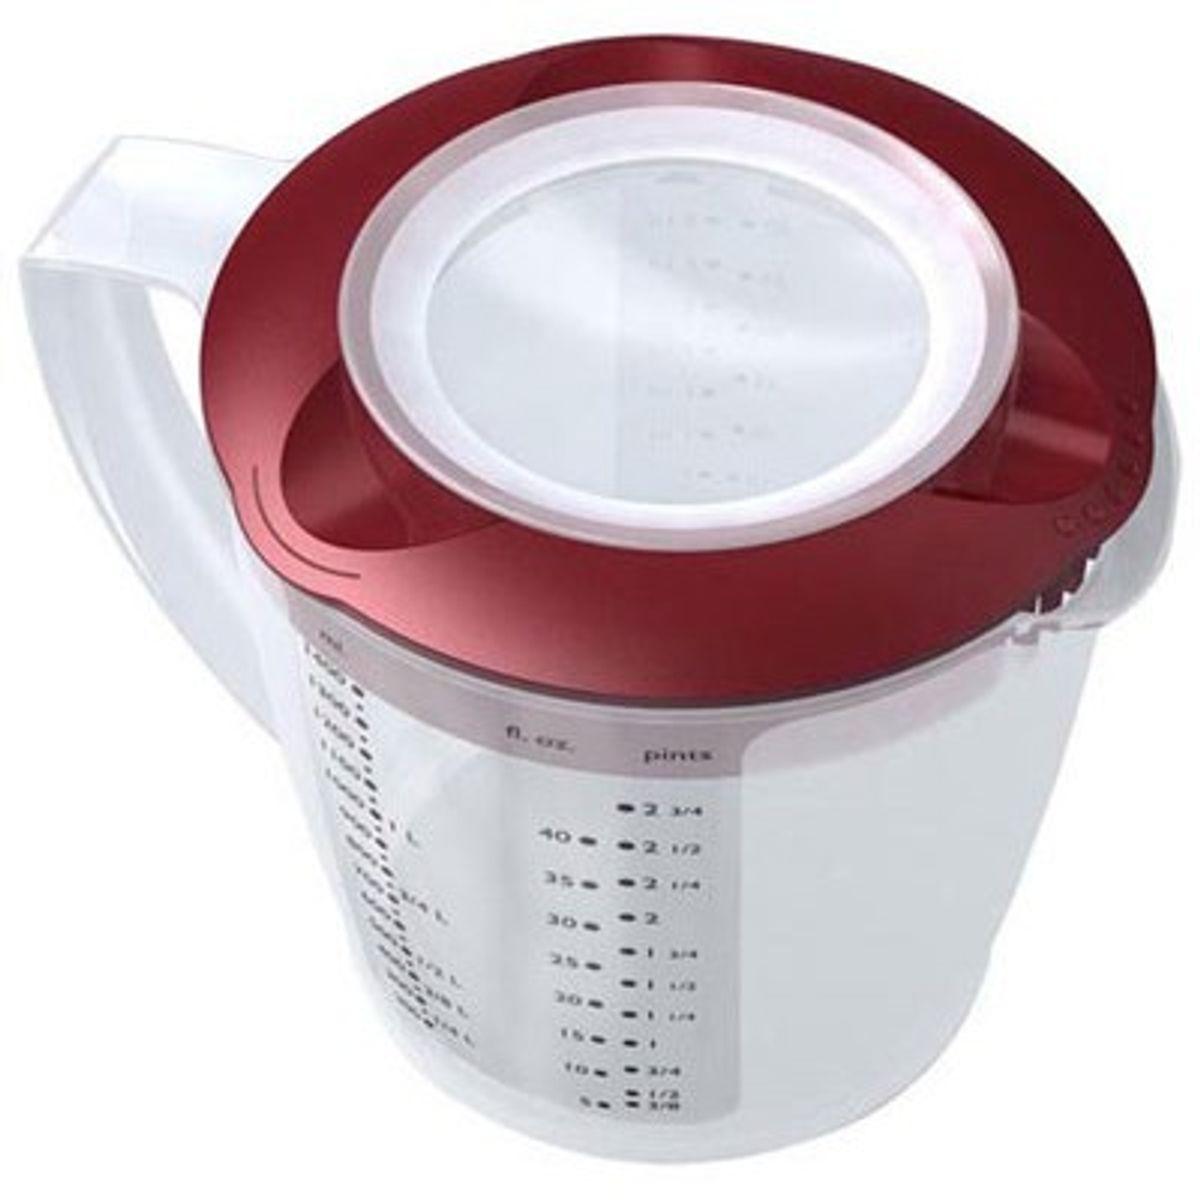 Mesure pichet mixeur - Westmark